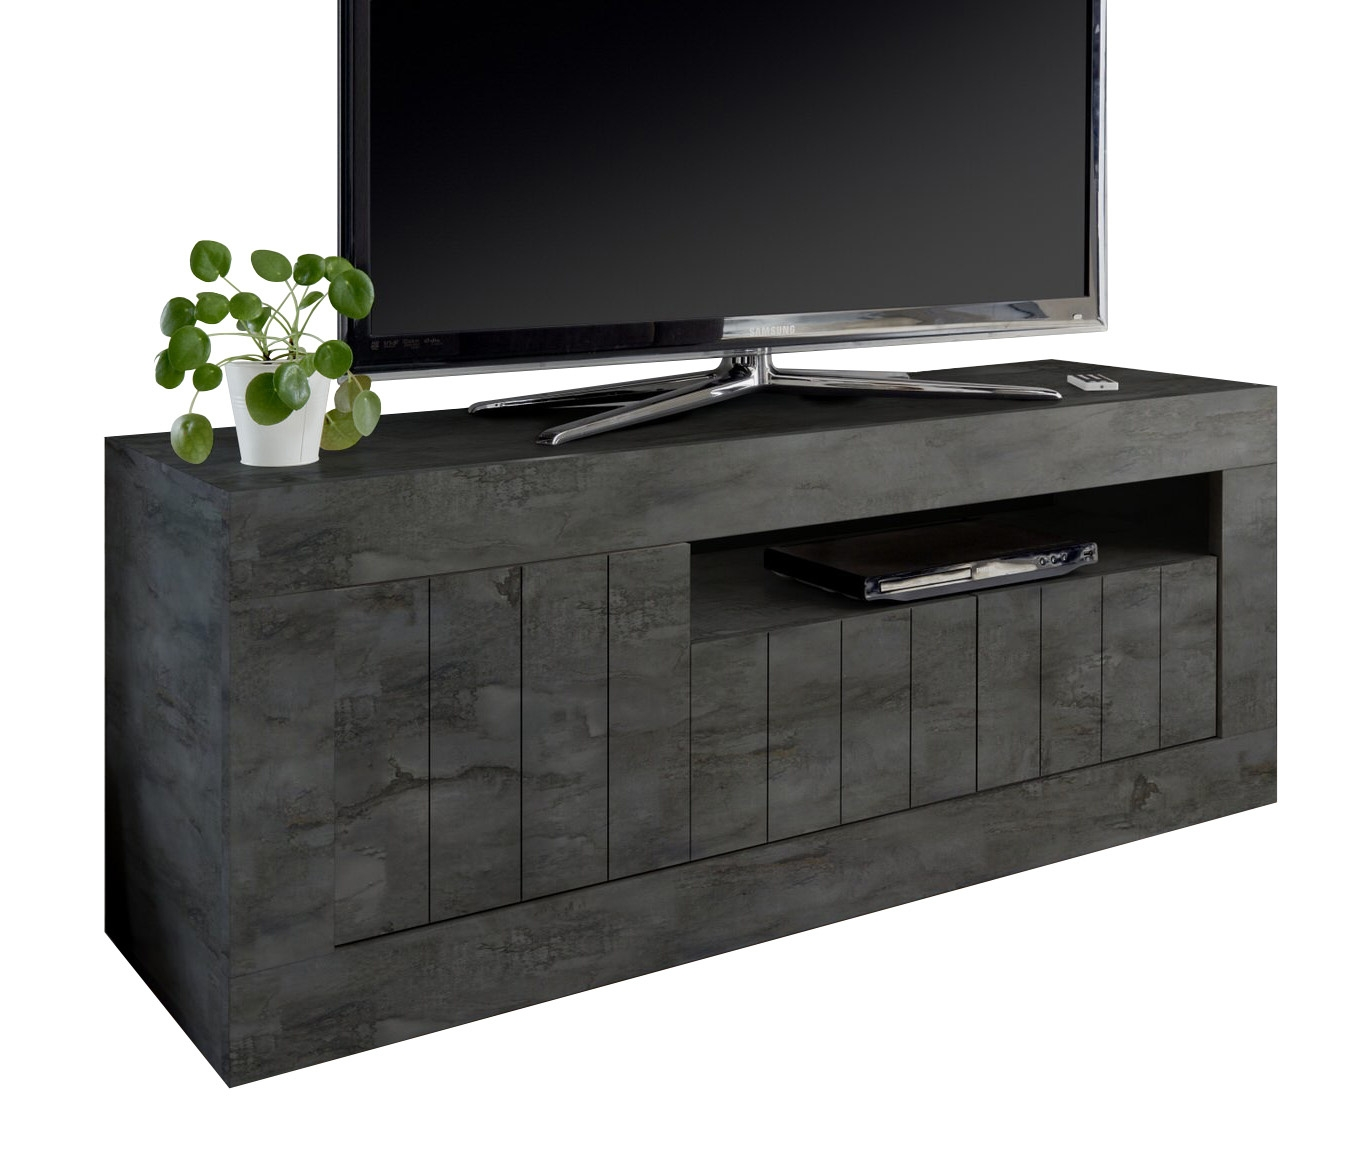 Tv-meubel Urbino 138 cm breed in oxid | Pesaro Mobilia